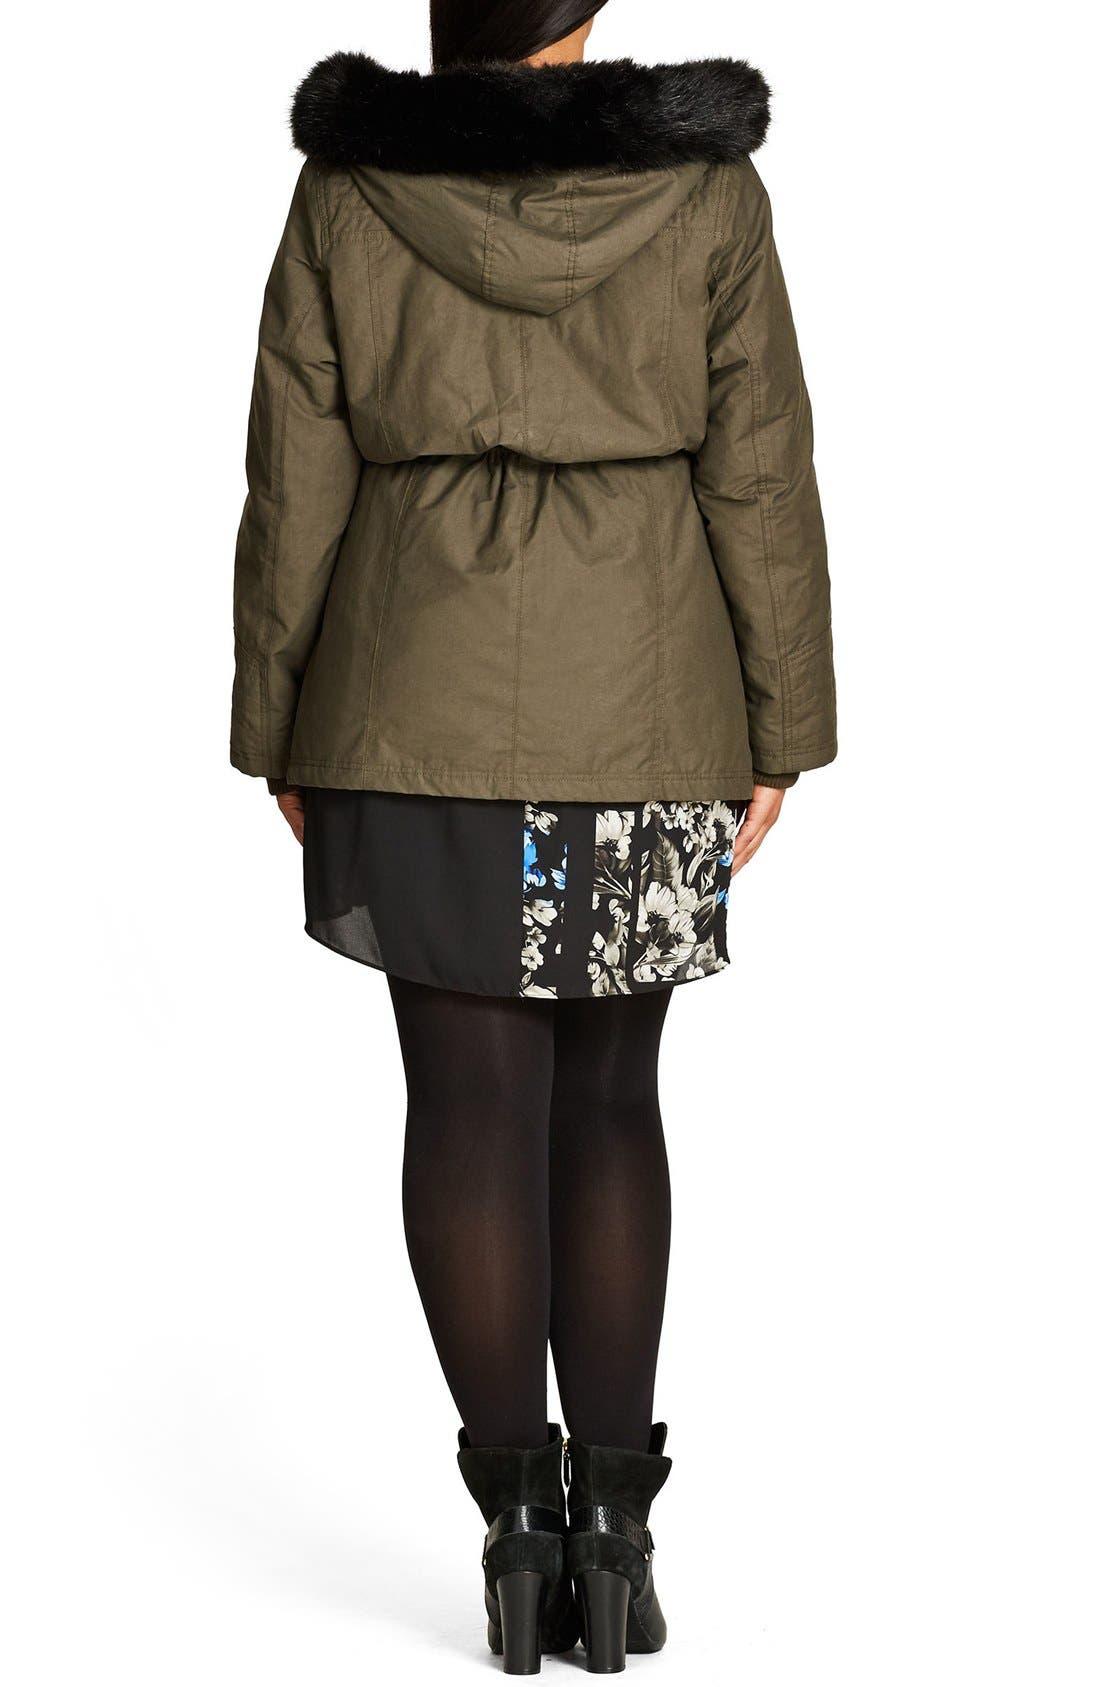 Alternate Image 3  - City Chic Faux Fur & Faux Leather Trim Hooded Drawstring Parka (Plus Size)